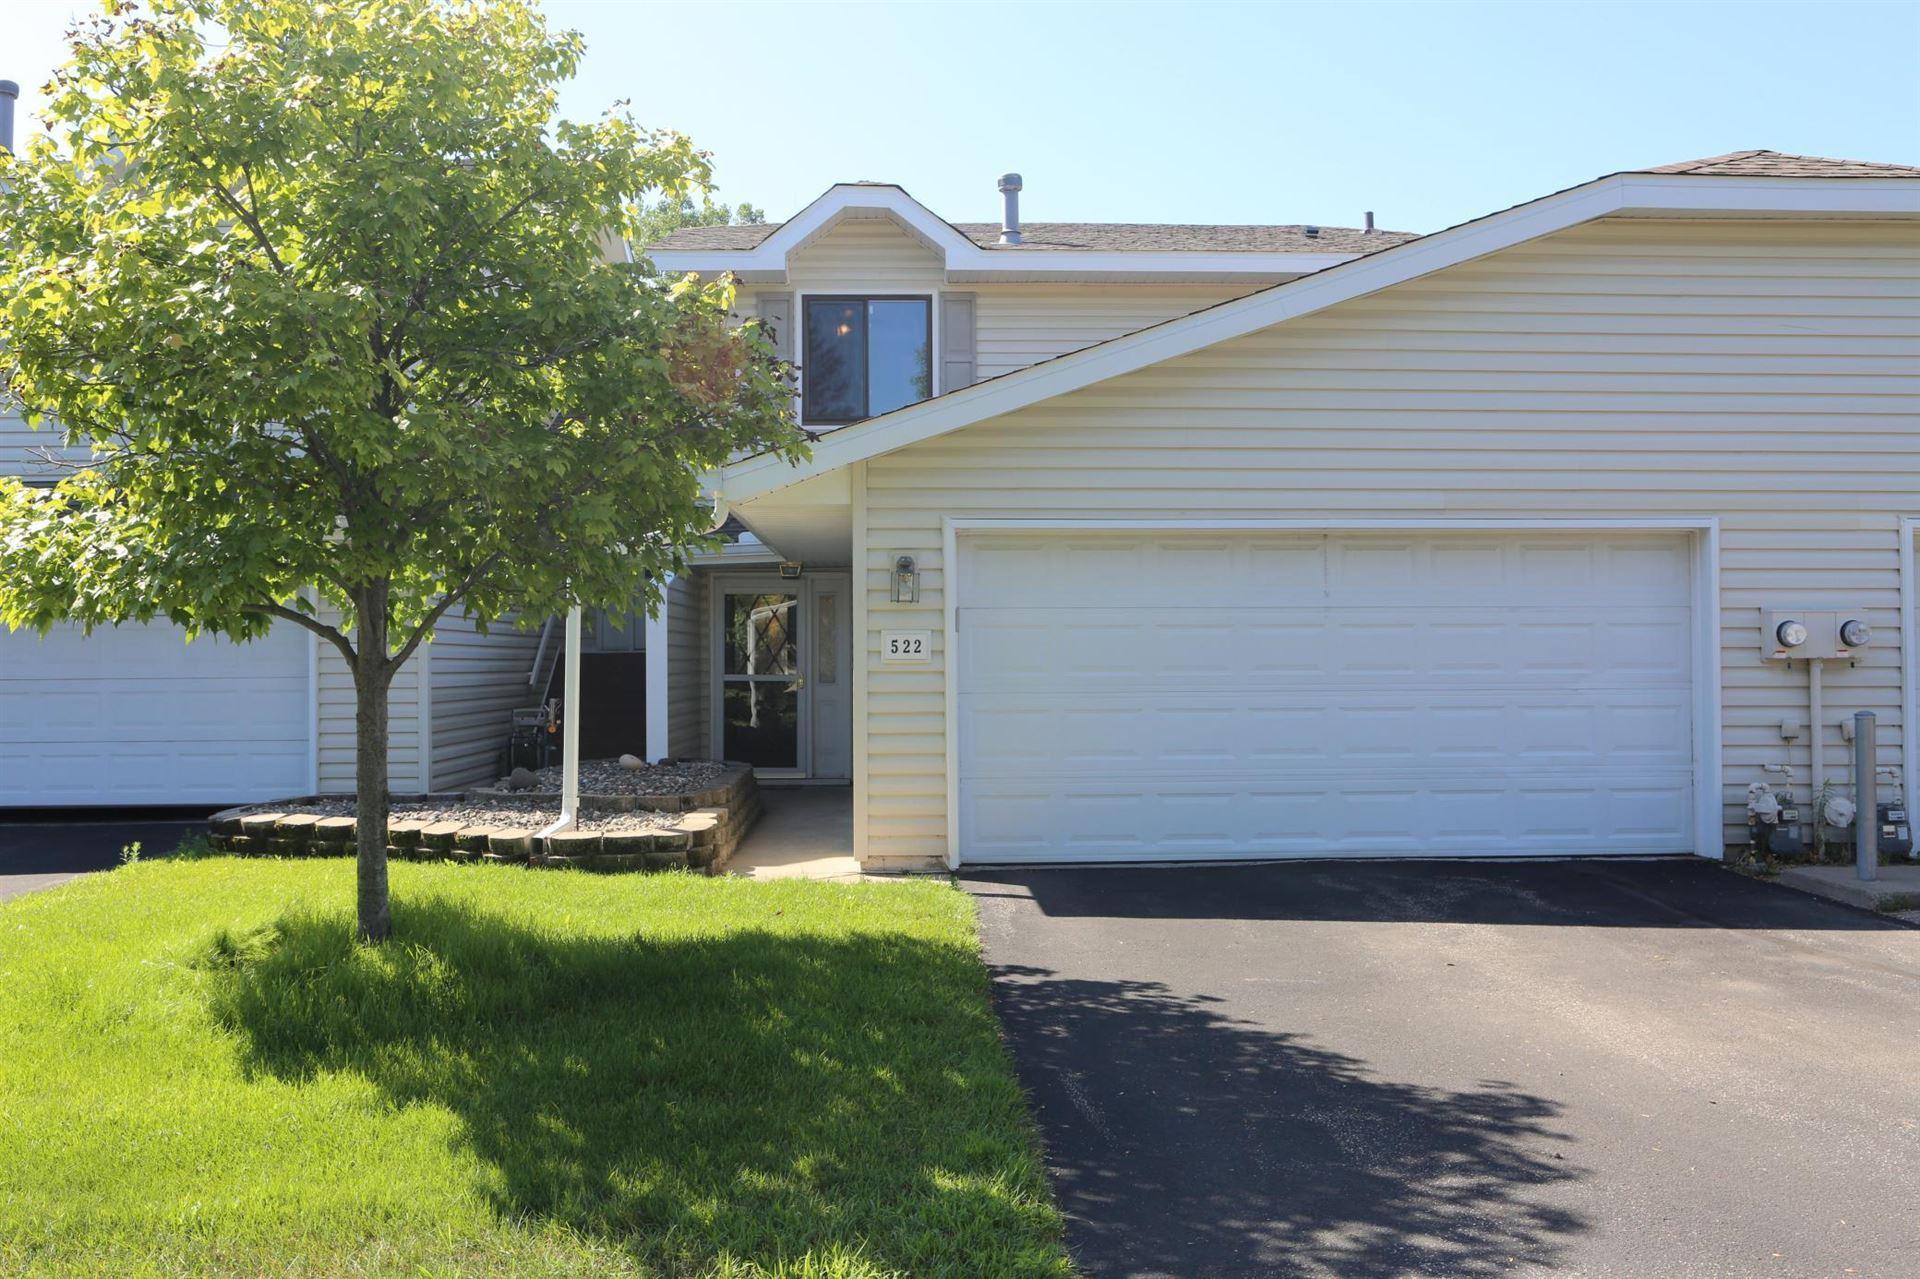 522 Pleasure Creek Drive NE, Blaine, MN 55434 - MLS#: 5623413